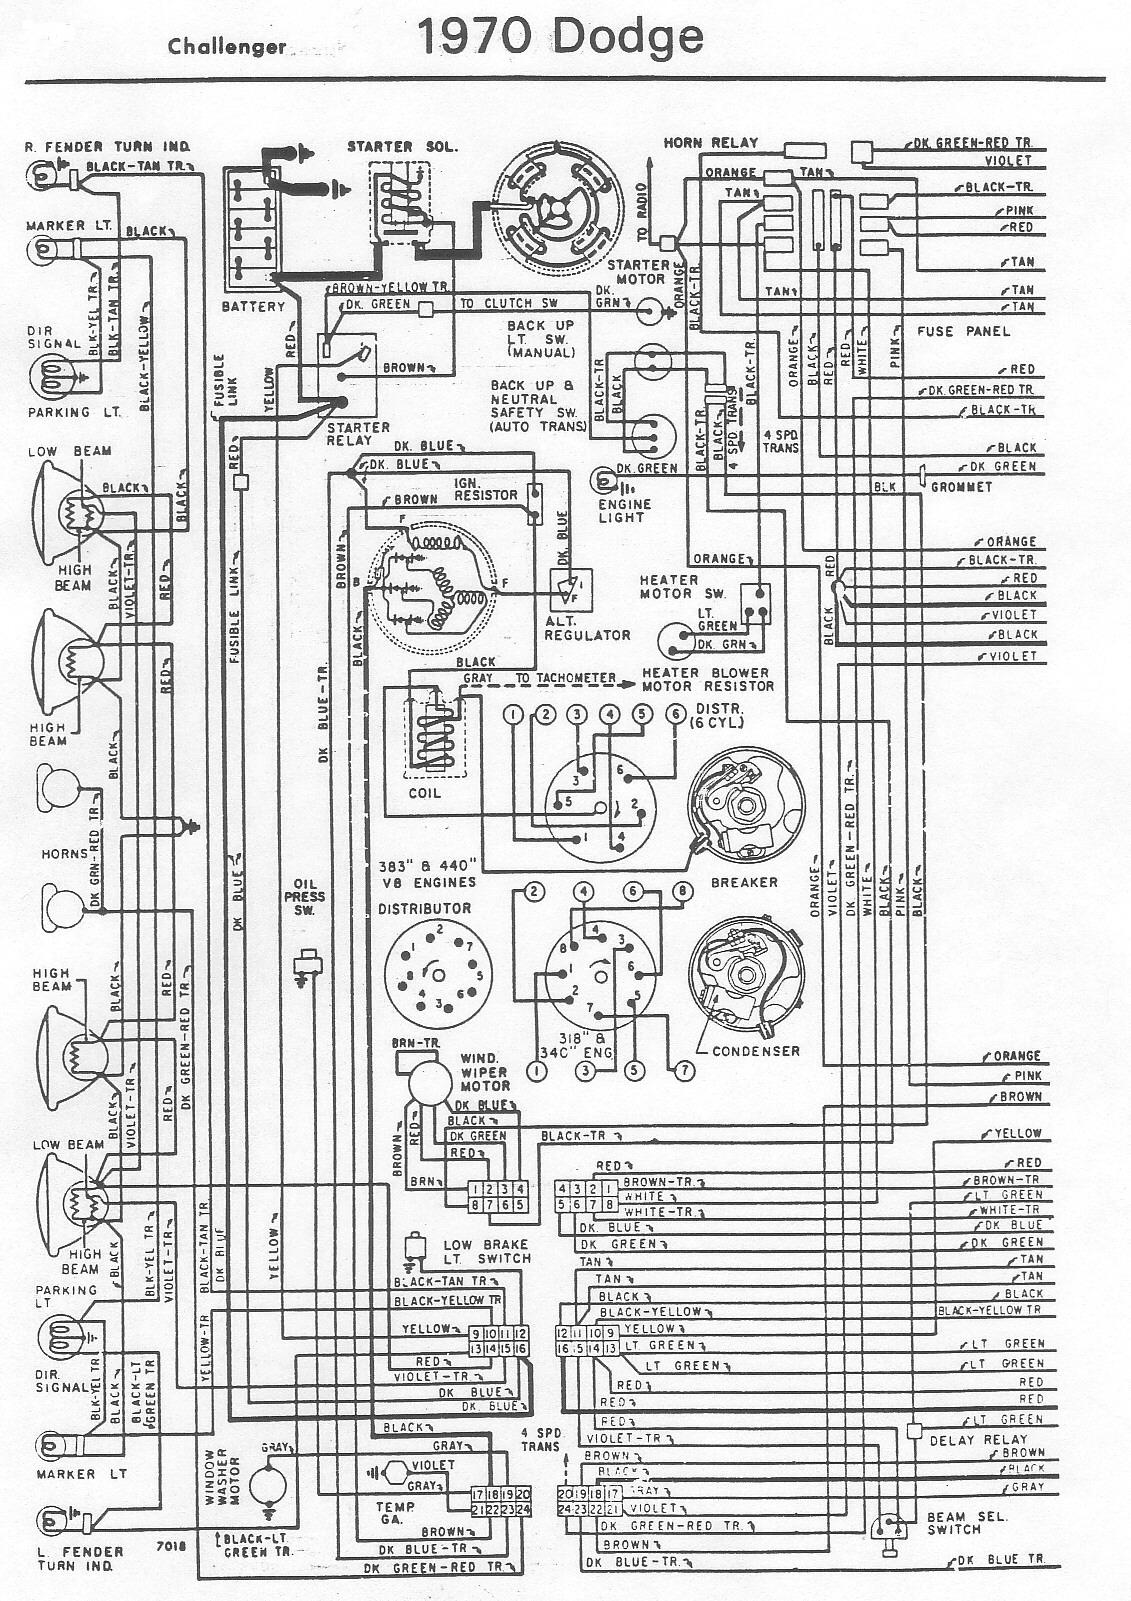 1974 dodge challenger wiring harness 1970 dodge challenger dash wiring harness wiring diagram data  1970 dodge challenger dash wiring